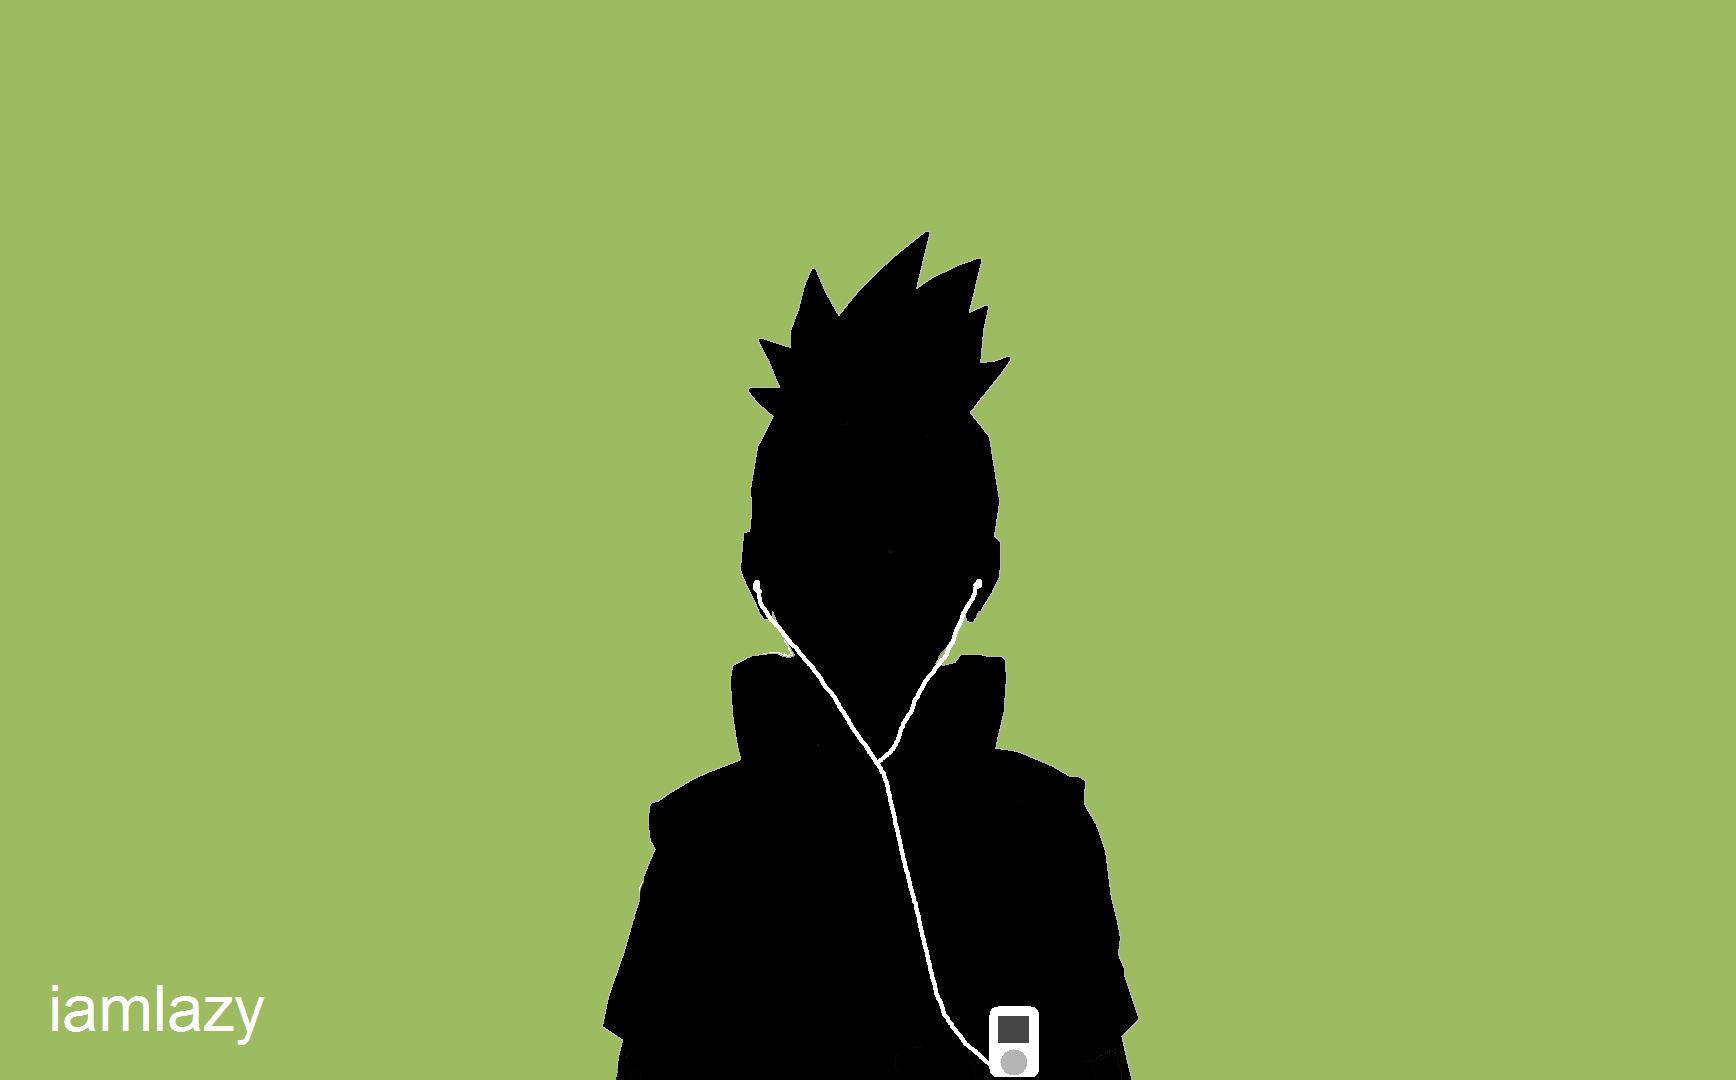 Amazing Wallpaper Naruto Silhouette - naruto_ipods_shikamaru_by_kaerae  Image.png